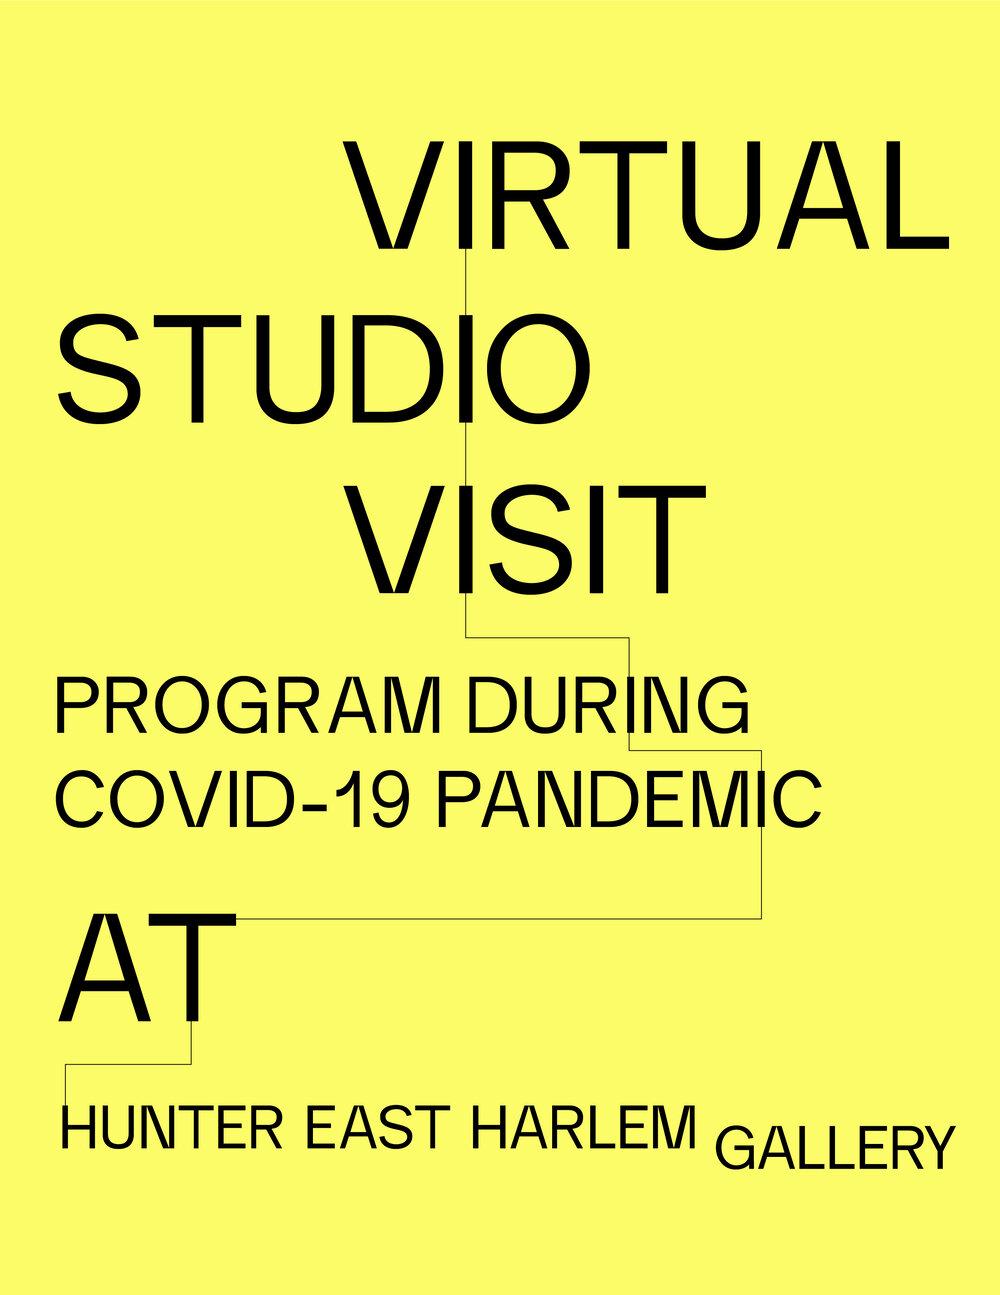 Virtual-Studio-Visit_ad